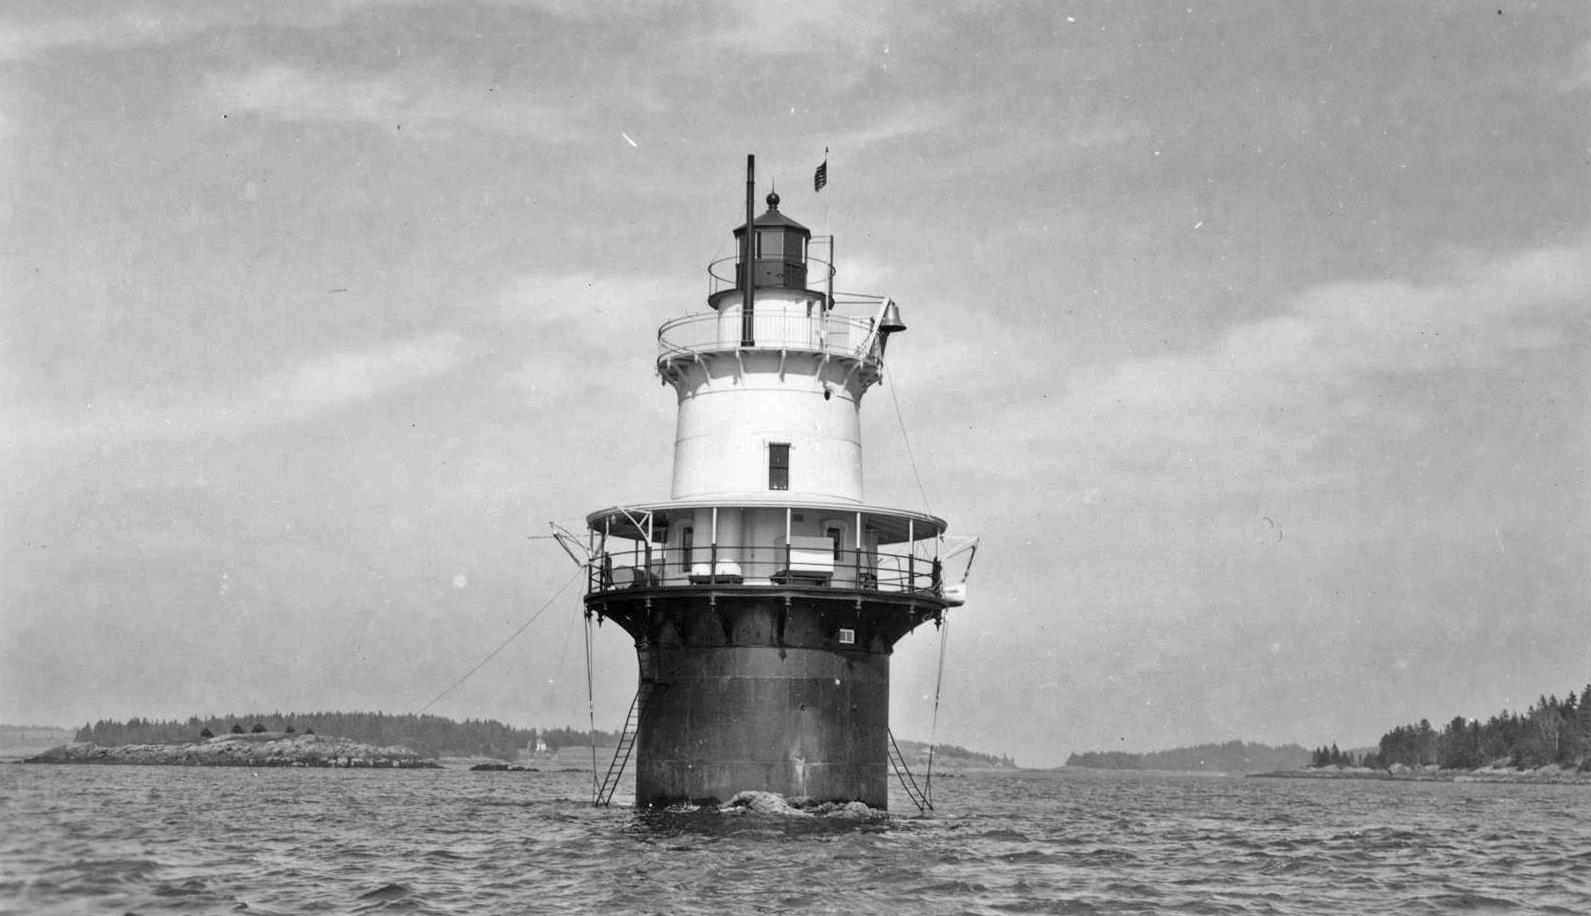 Goose Rocks Lighthouse, built in 1890